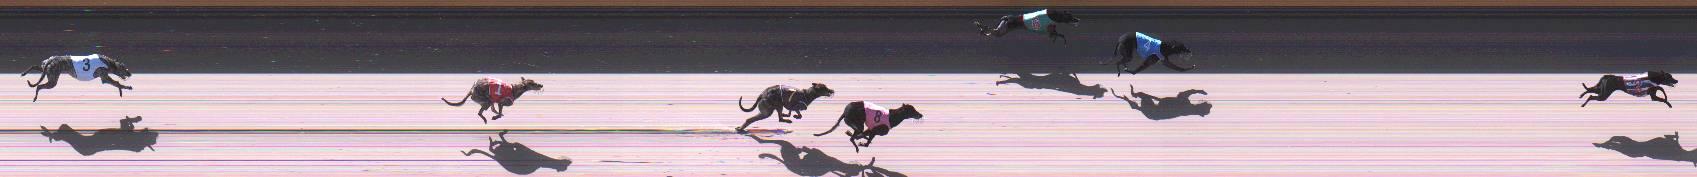 Race result finish photo